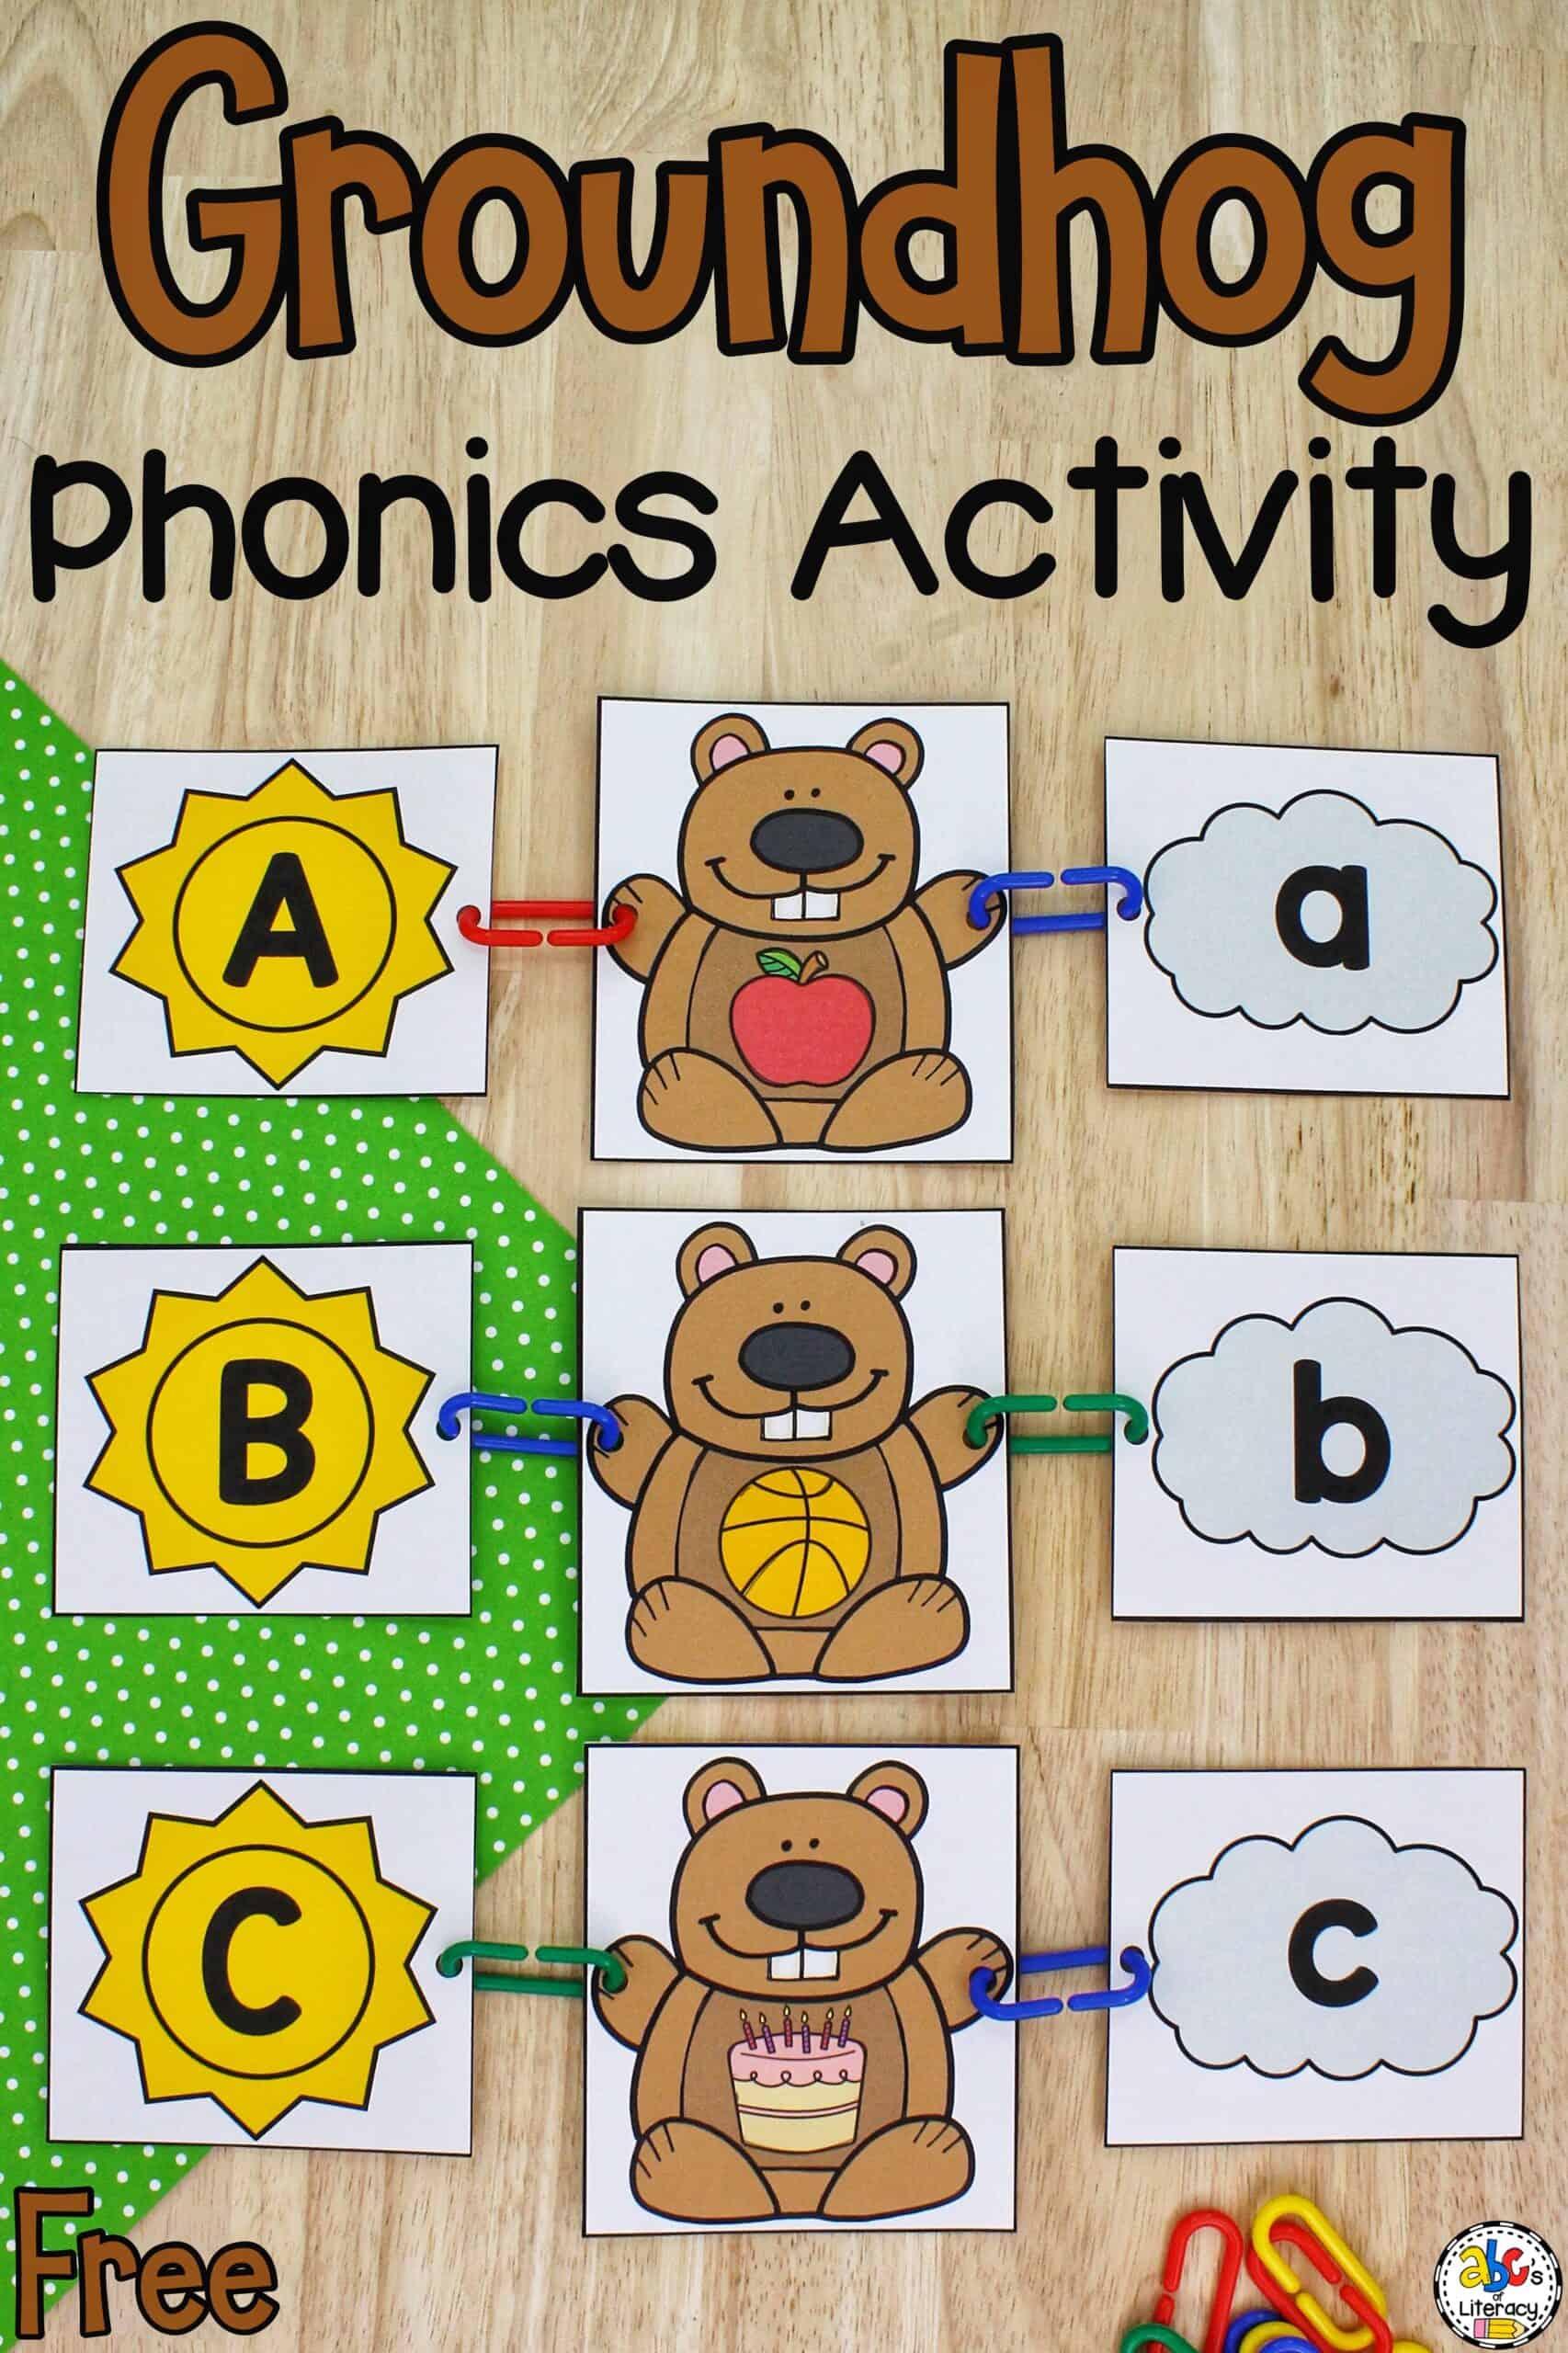 Groundhog Phonics Activity